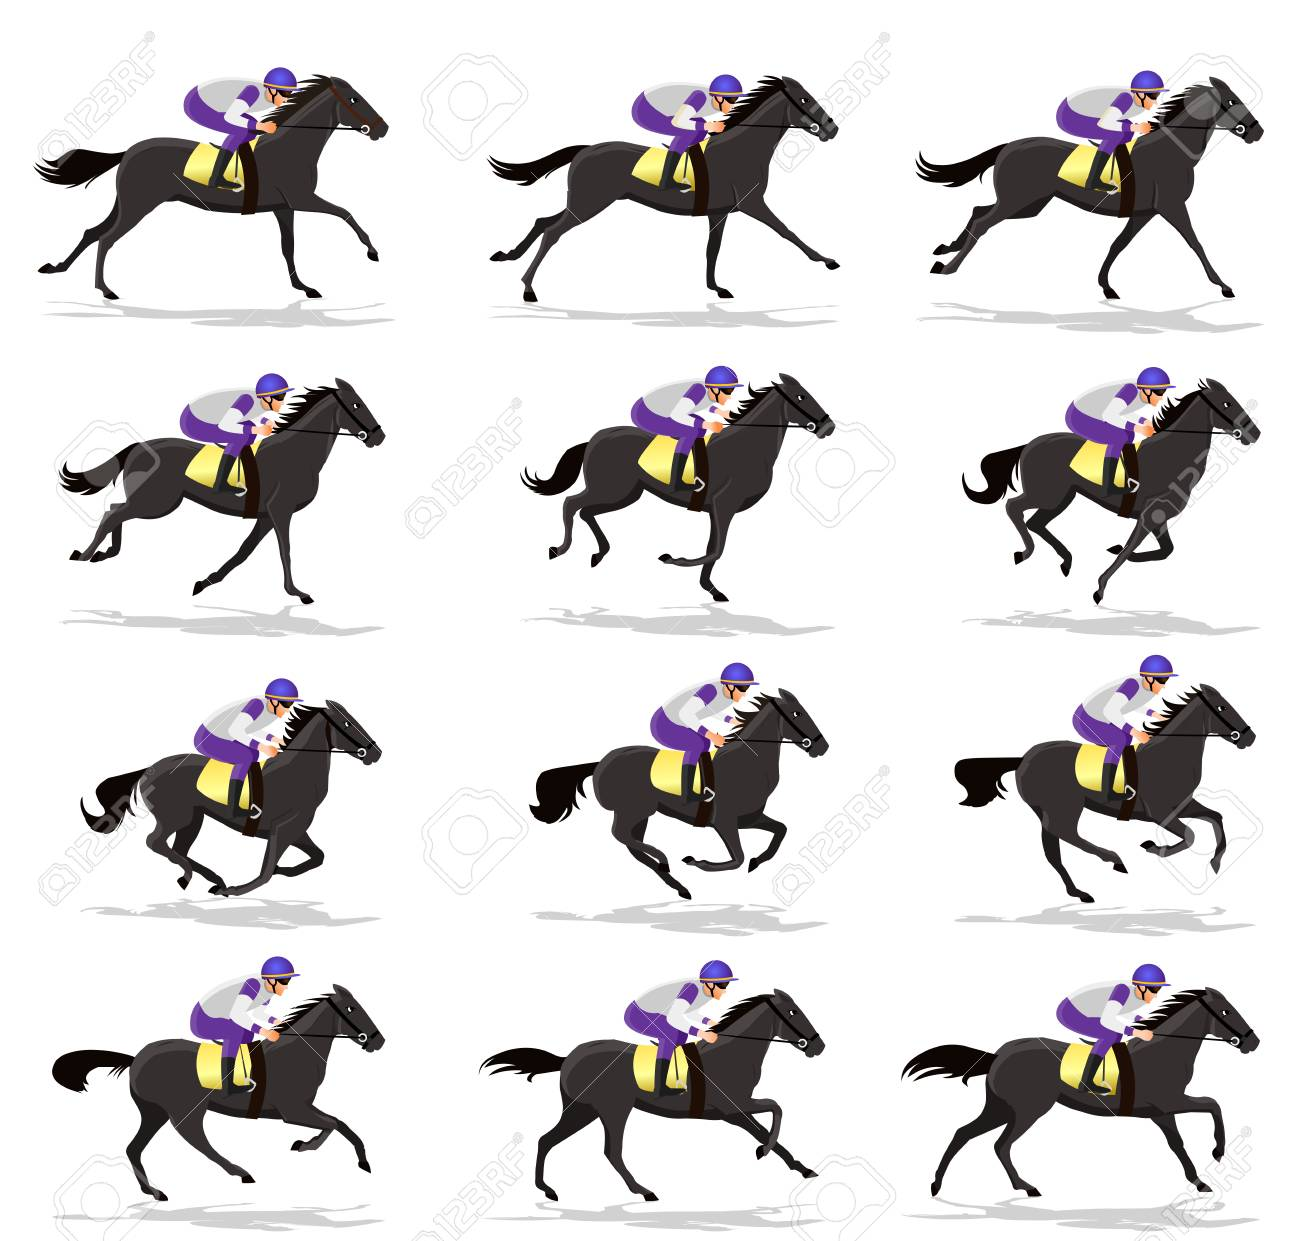 Horse Run Cycle animation Sprite sheet,Horse race Silhouette, Racecourse, Jokey, Rider - 91249740